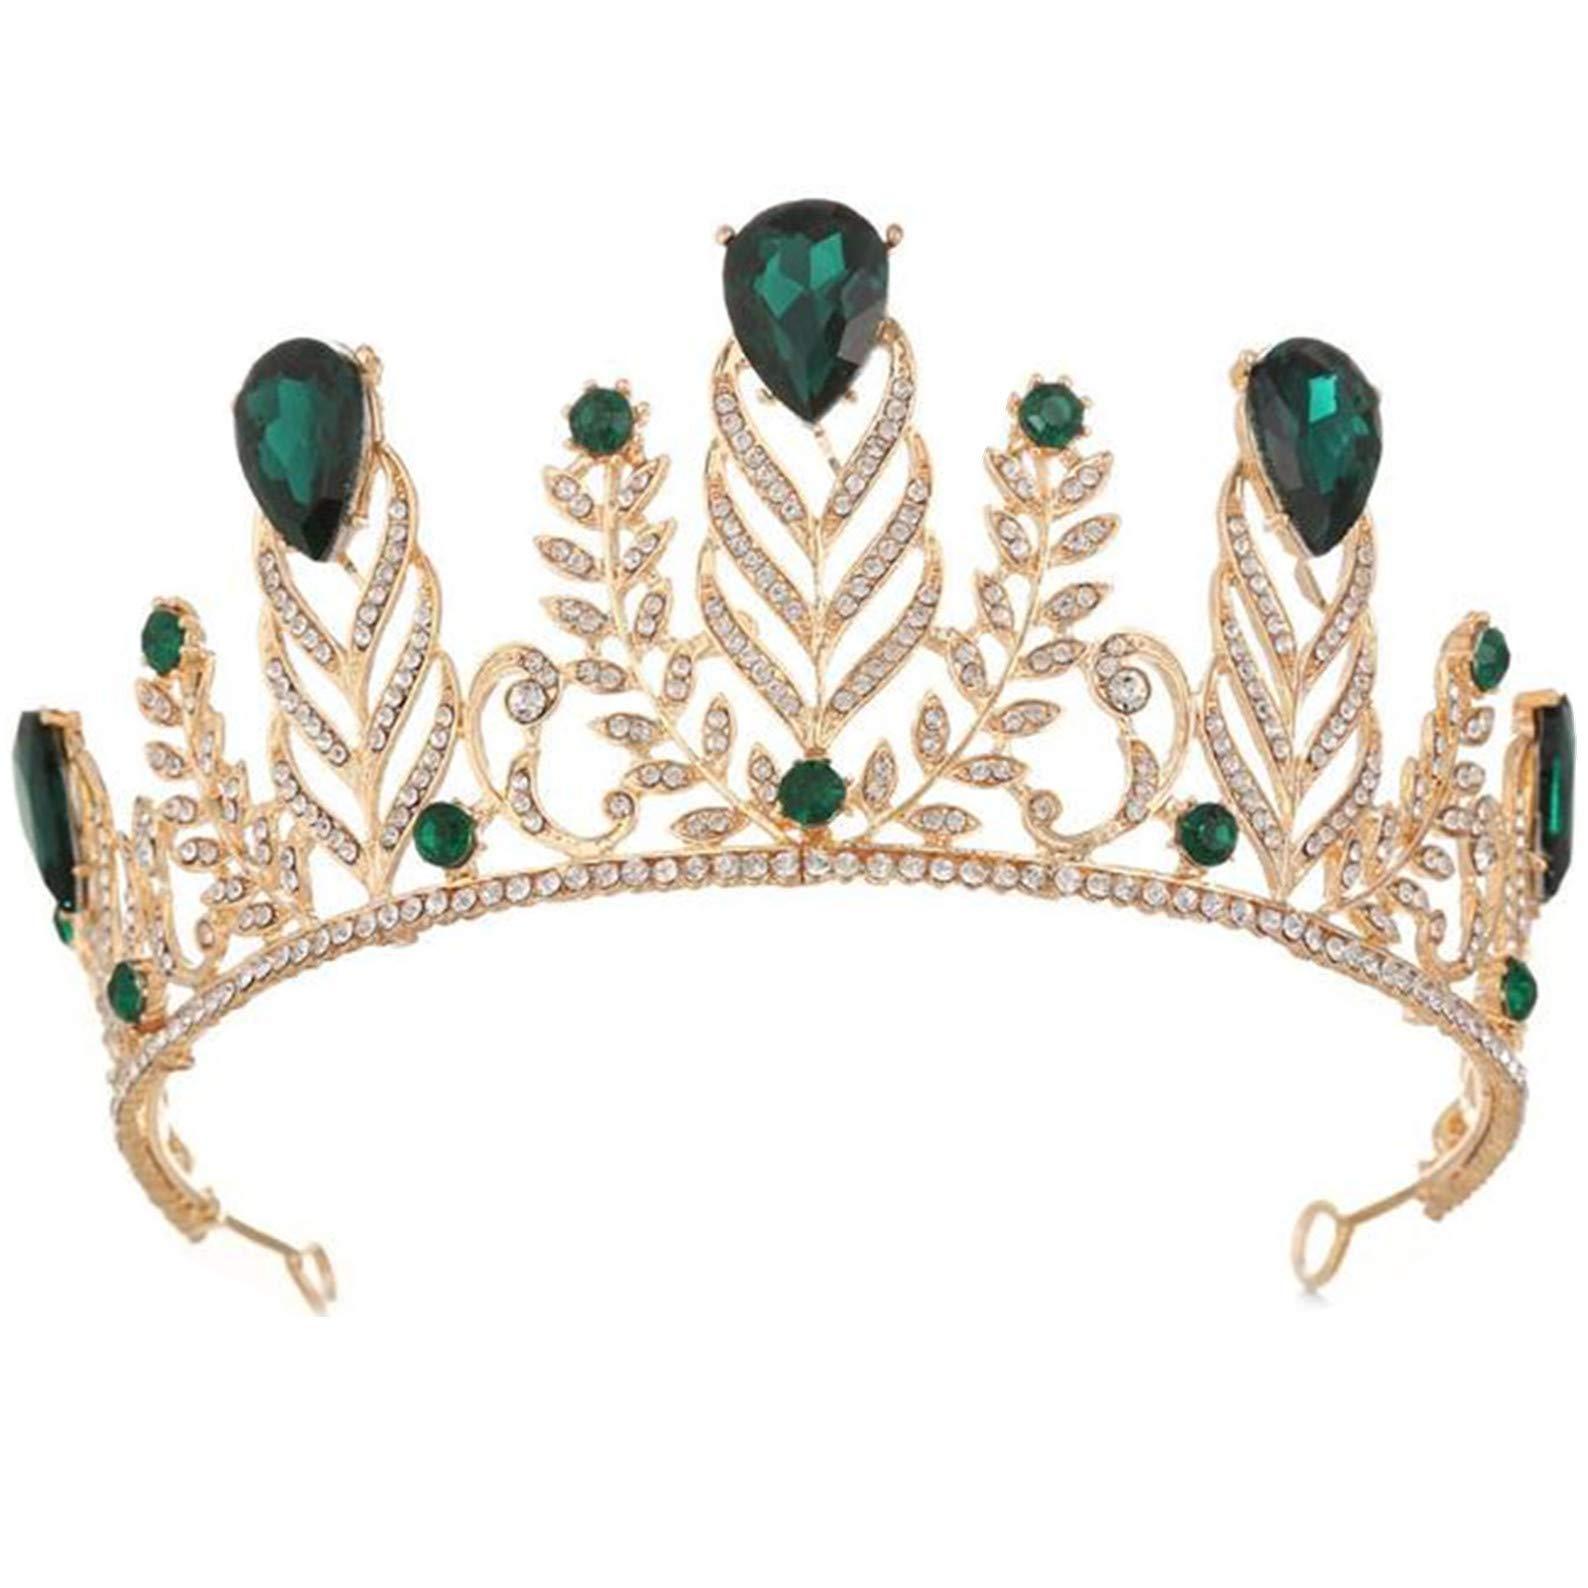 Wiipu Vintage Rhinestone Feather Crown Wedding Crystal Leaf Bride Tiara Headband(A1346) (Green)